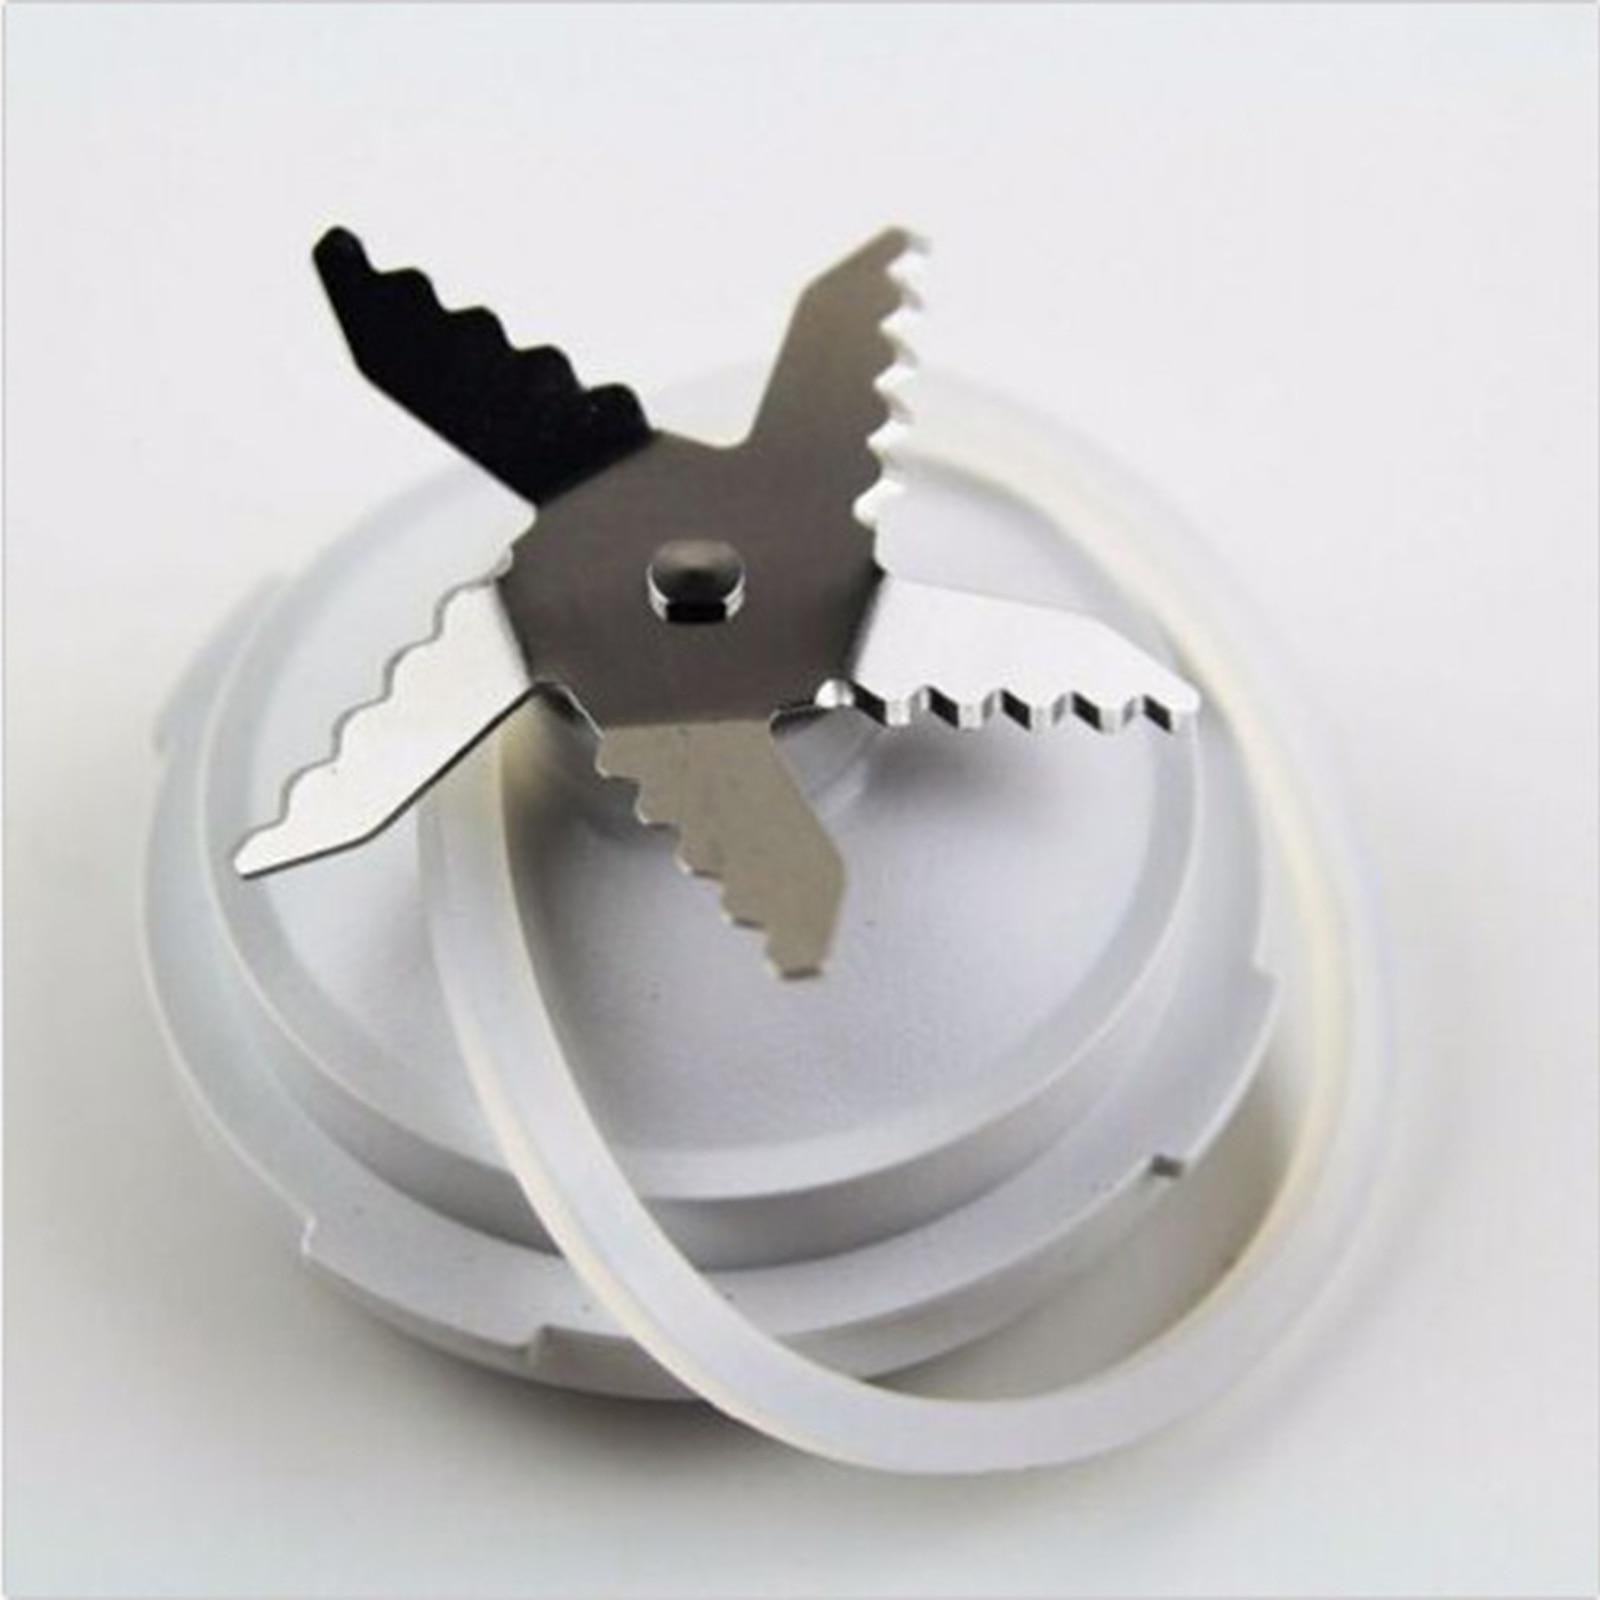 Blades Knife With Sealing Ring For Philips HR7625 HR7620 RI7620 RI7625 HR2160 Knife Holder Juicer Blender Parts